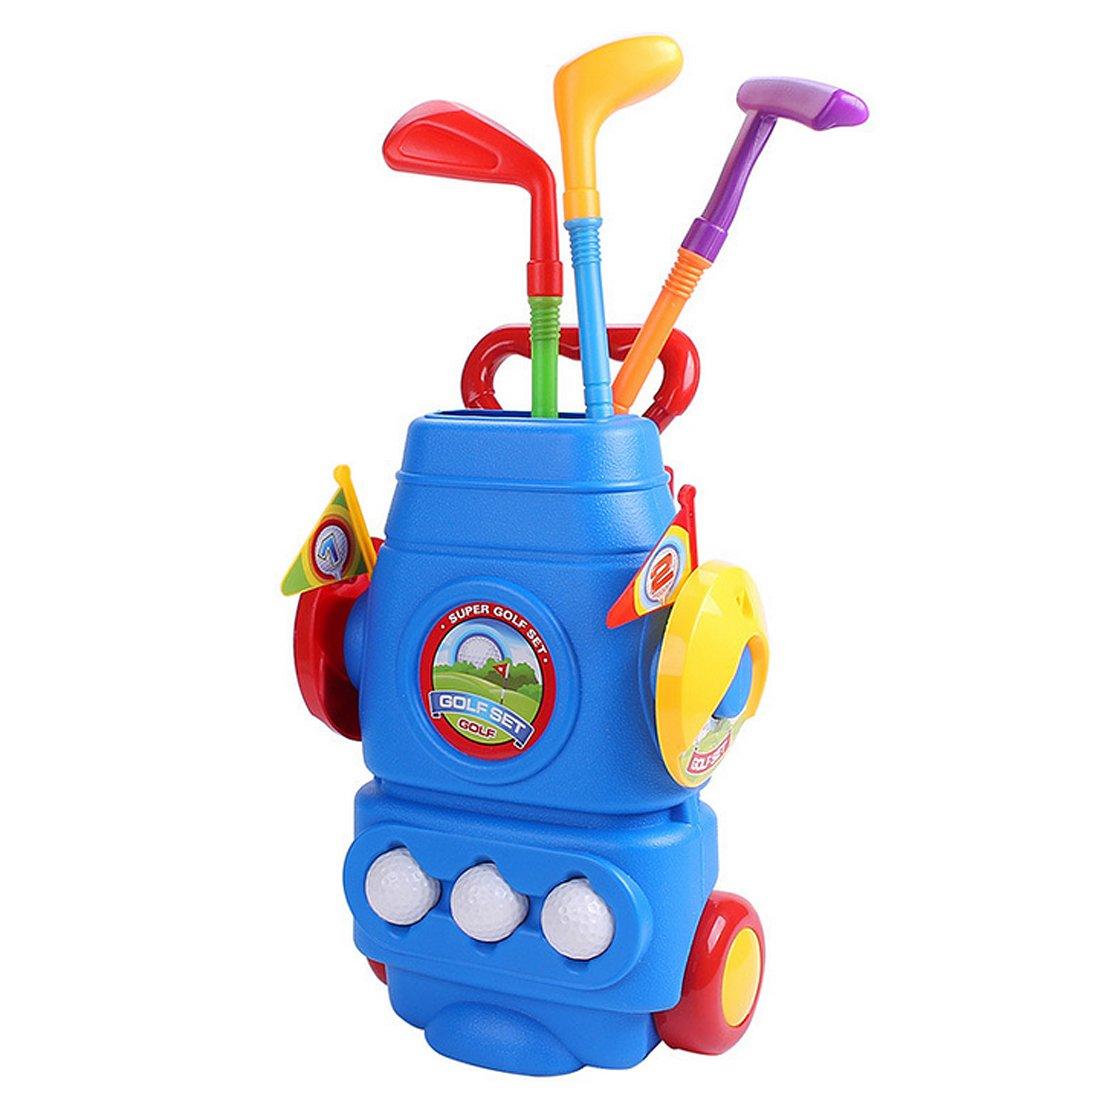 RuiyiF Golf Toys Clubs Set for Kids Toddlers Boys Girls with 3Golf Balls, 3Golf Clubs, 2Ball Holes,1Trolley Case B0796QTD7P